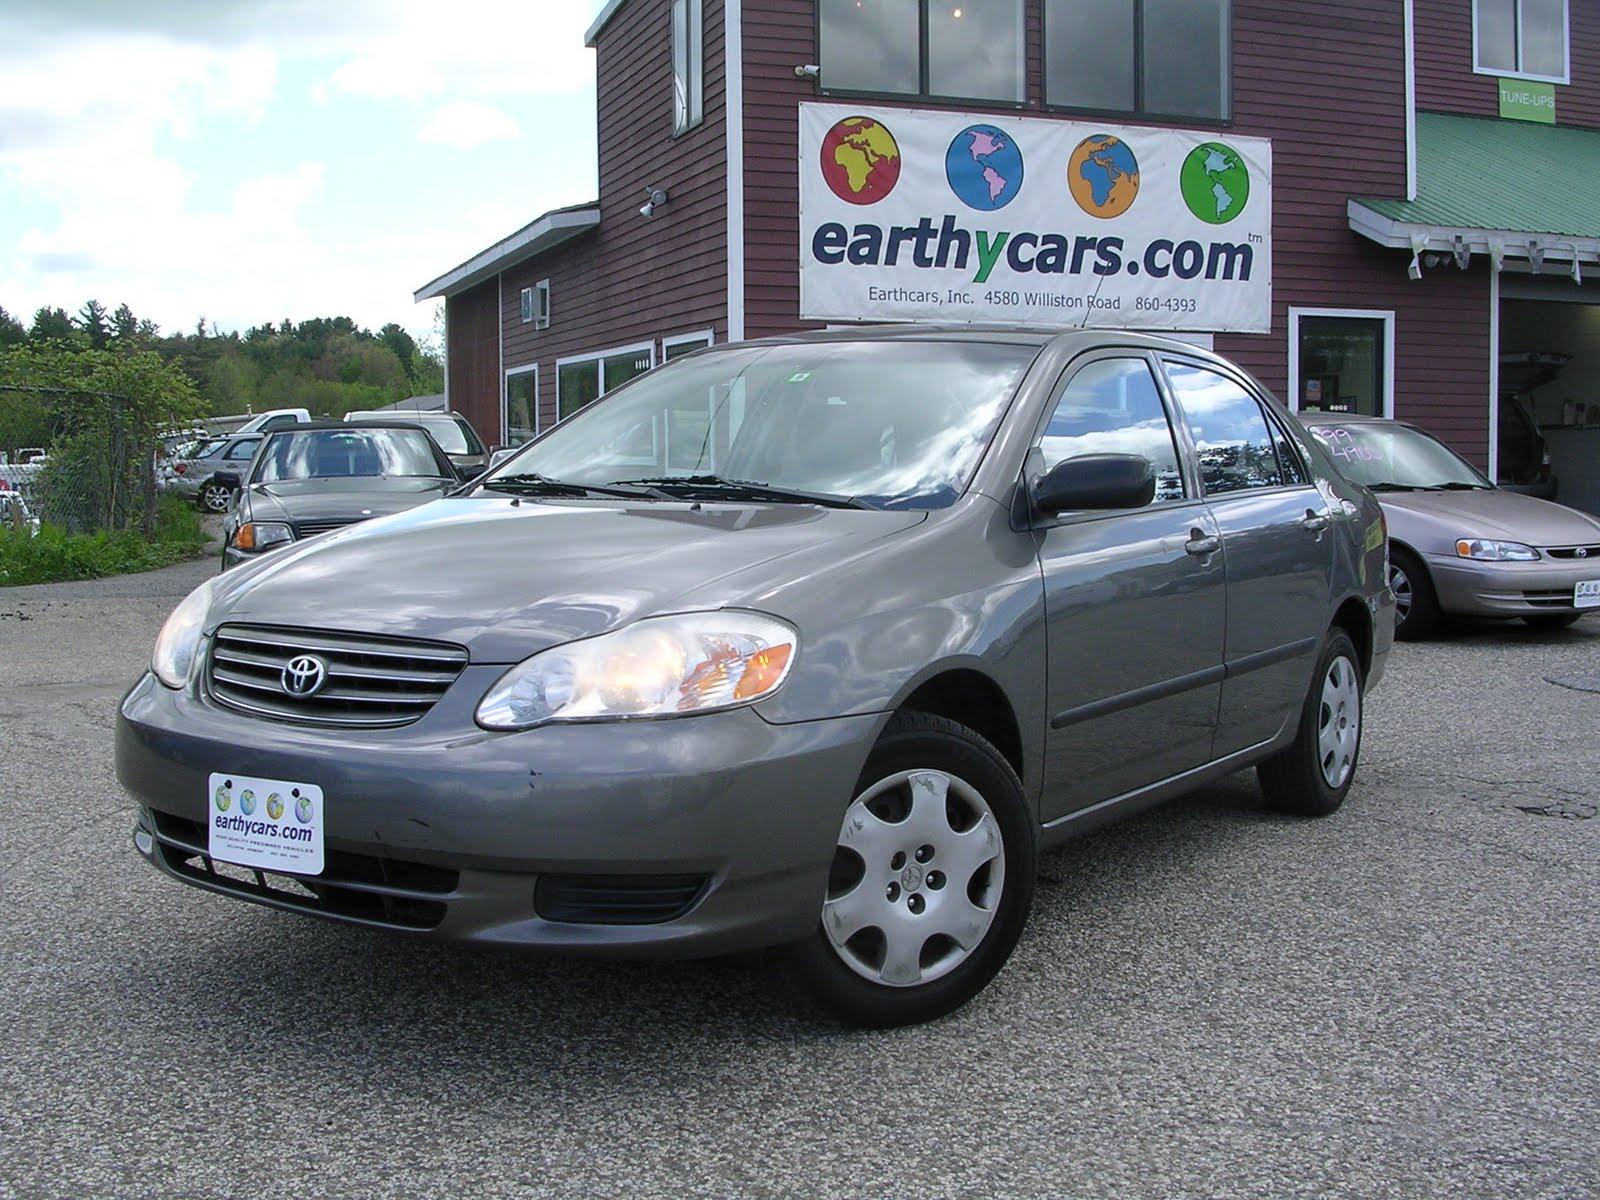 2003 Toyota Corolla CE, Sedan, Grey, 139277 Mi, $7,900 $7,500  Http://bit.ly/k9475E Compact, 4 Spd Automatic, MPG U003d 25/34